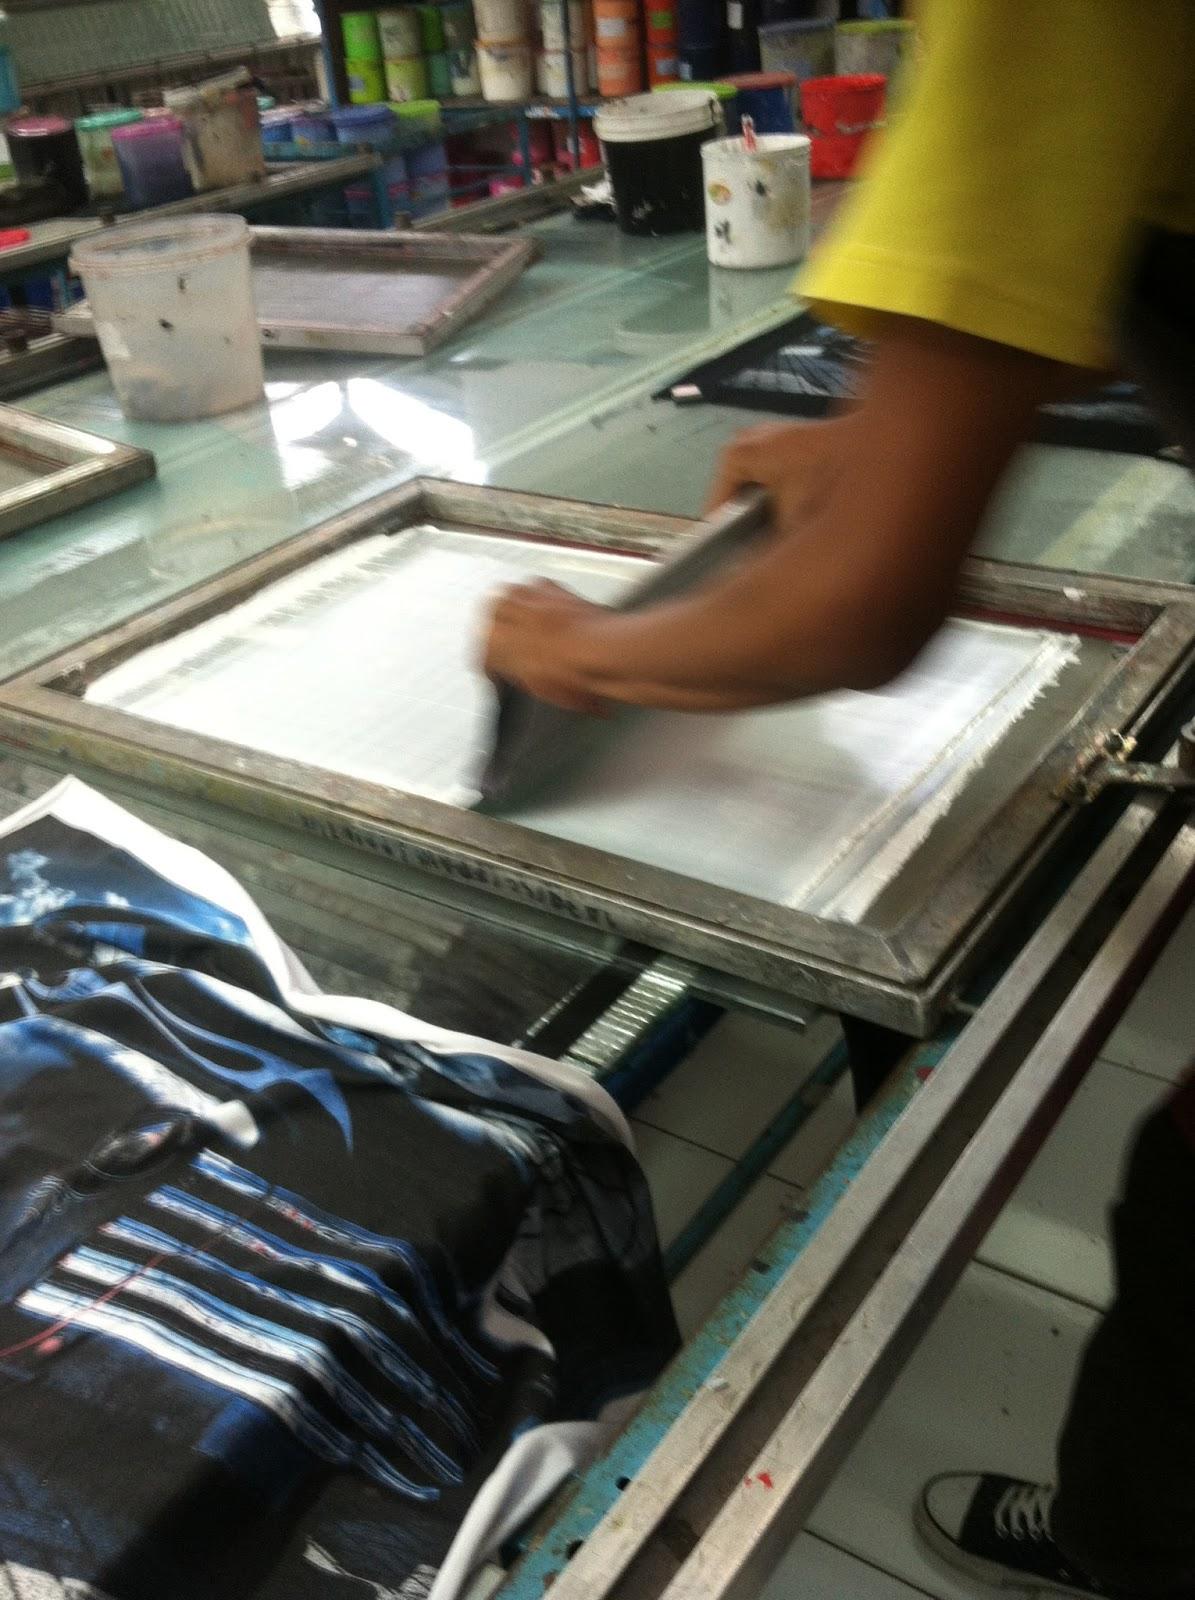 screen printing vs digital printing Making ense of ide ormat igital digital dots td digitaldotsorg 1 wild format screen printing versus digital printing screen printing and inkjet printing are both.